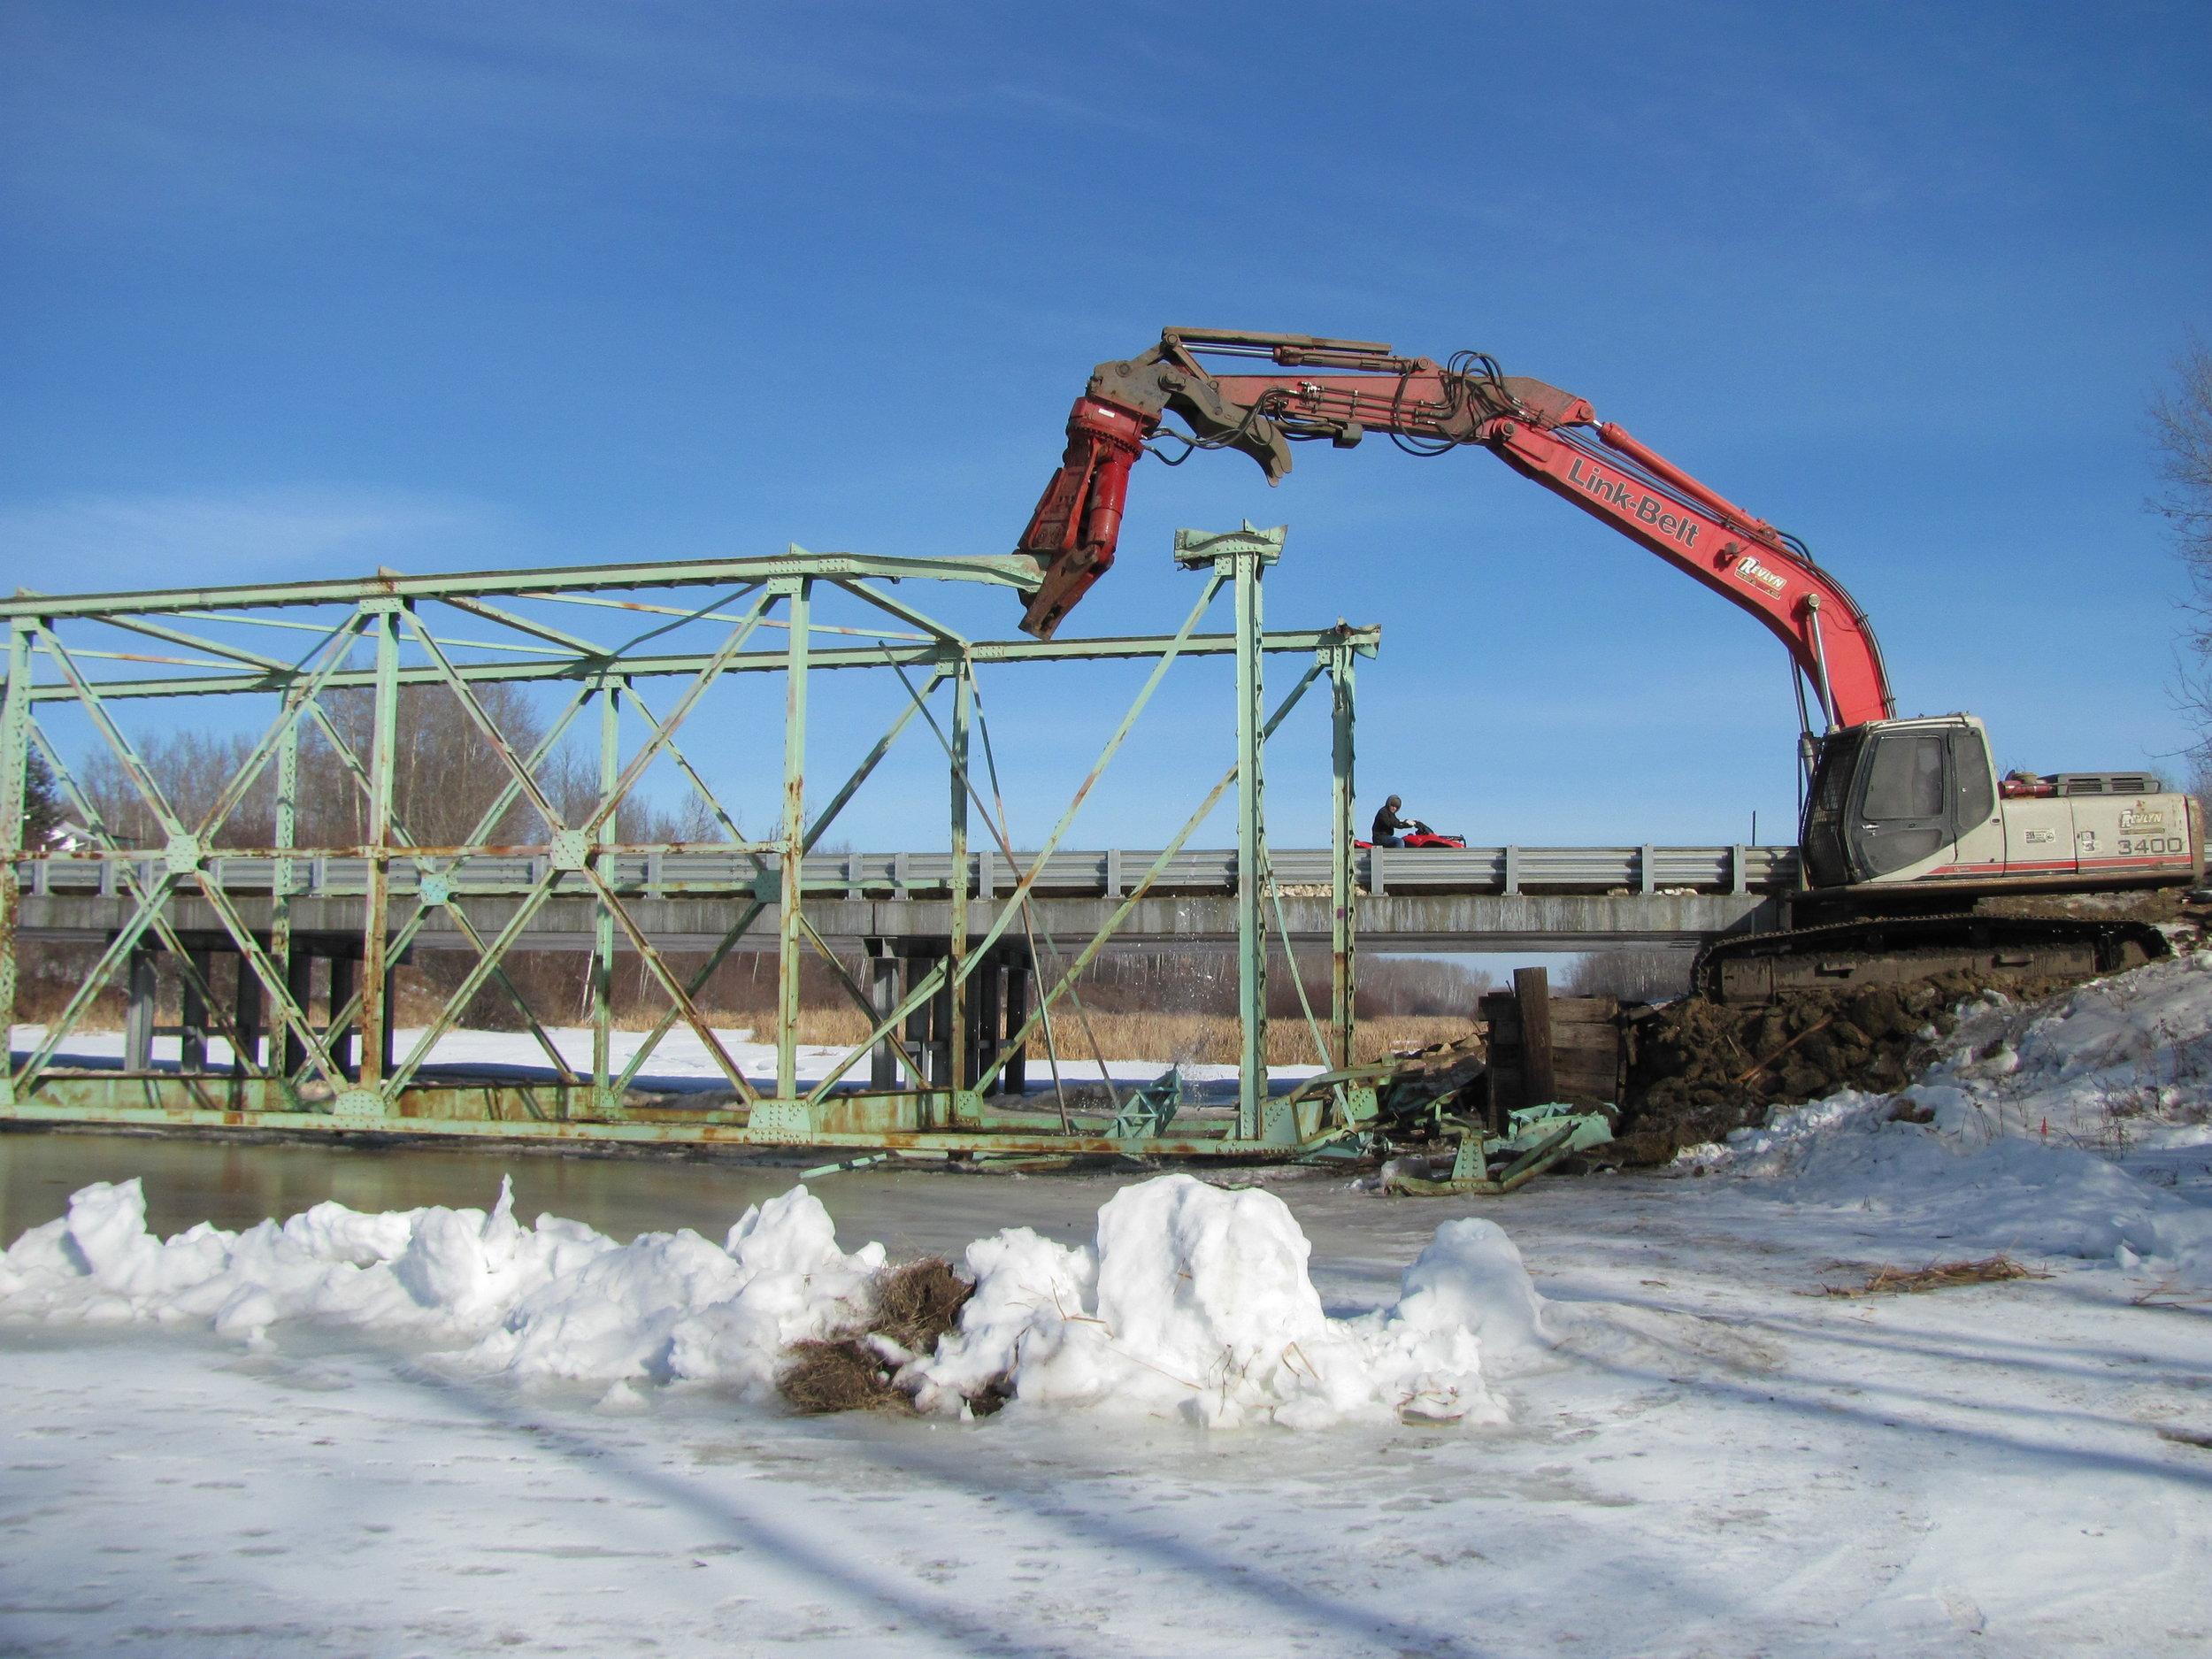 Lac La Biche Steel Bridge Bridge Demolition .jpg